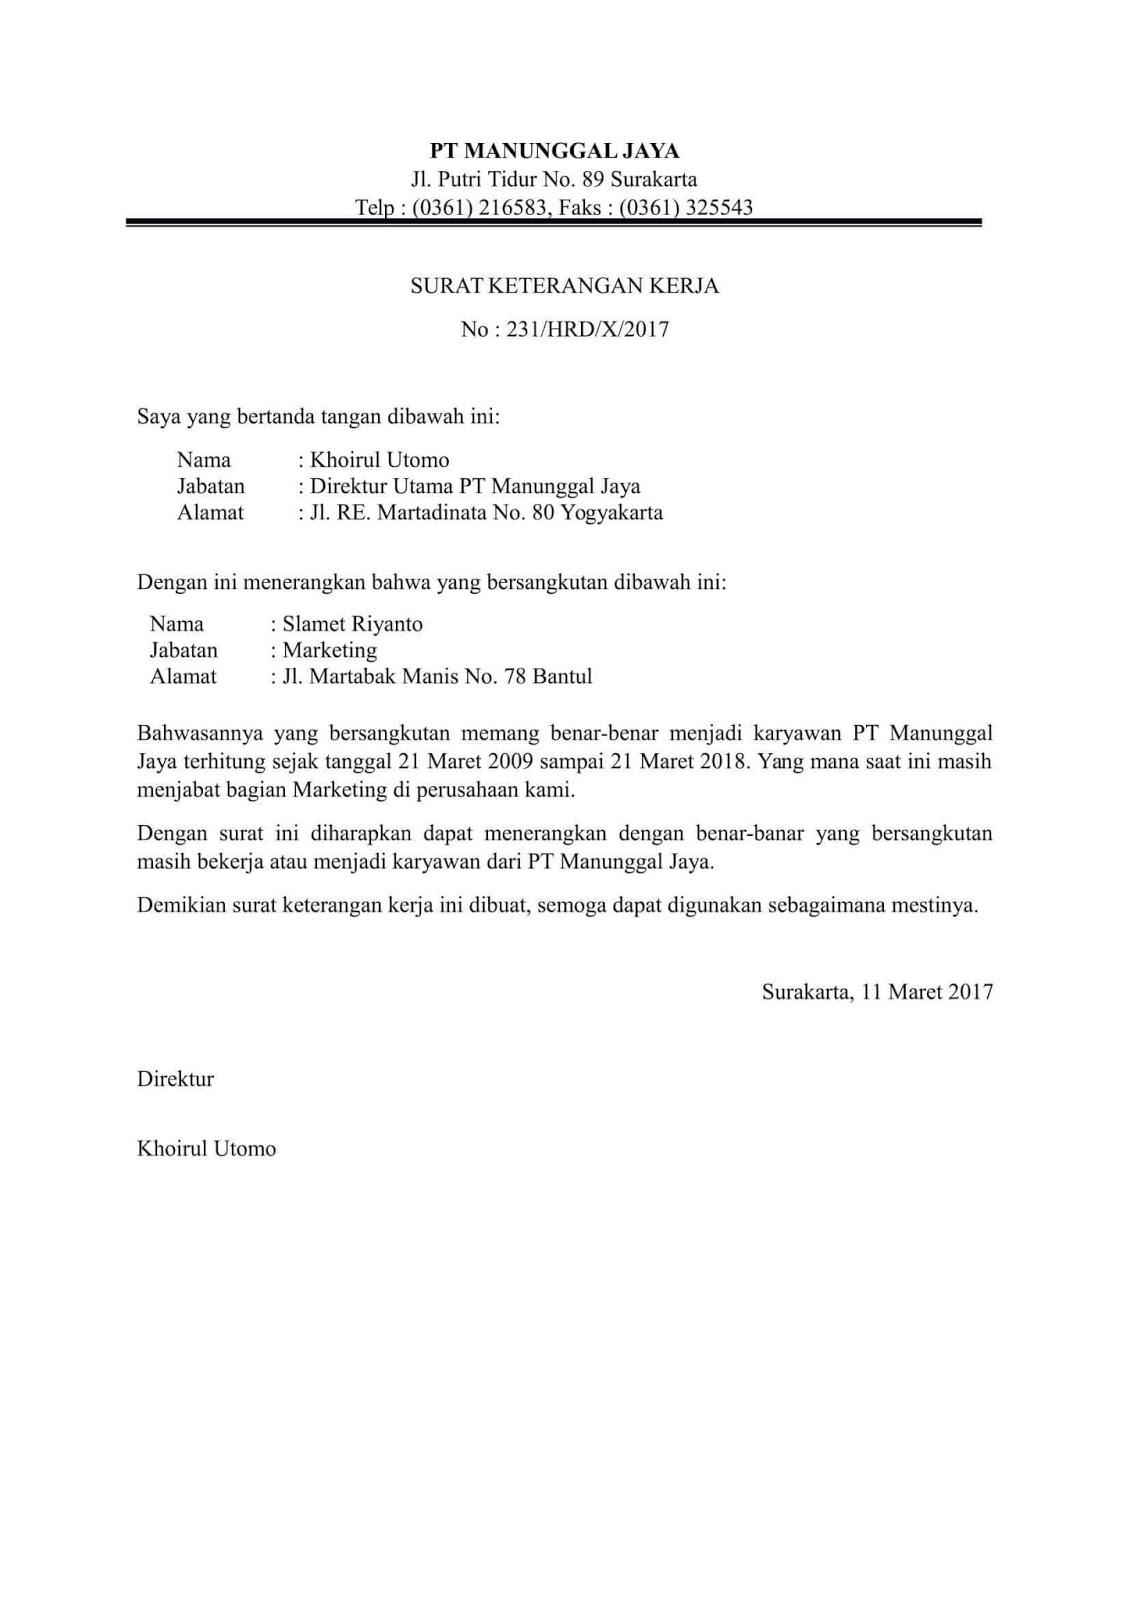 Contoh Surat Keterangan dan Pernyataan Karyawan